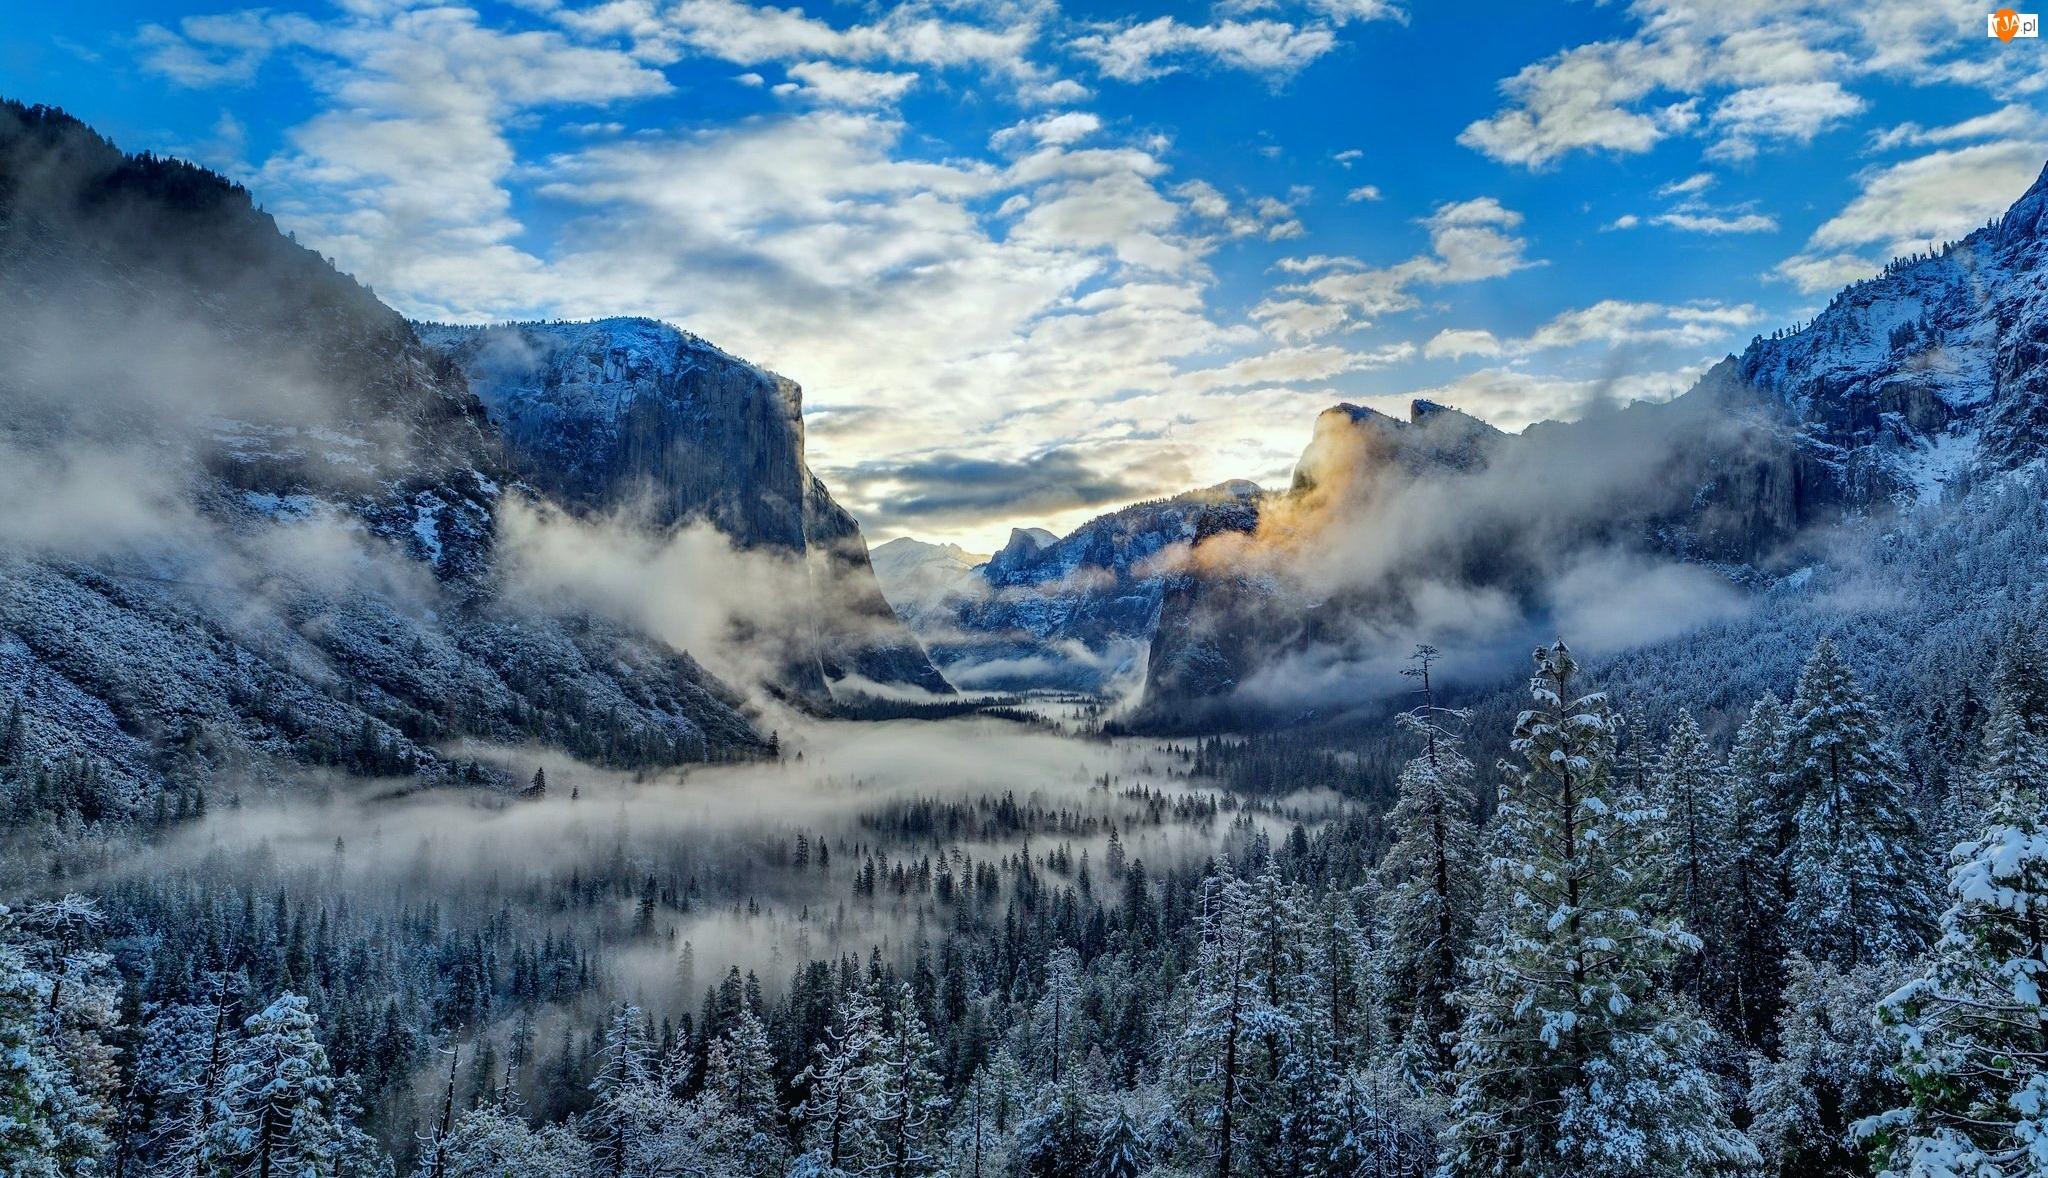 Dolina Yosemite Valley, Zima, Kalifornia, Mgła, Park Narodowy Yosemite, Góry